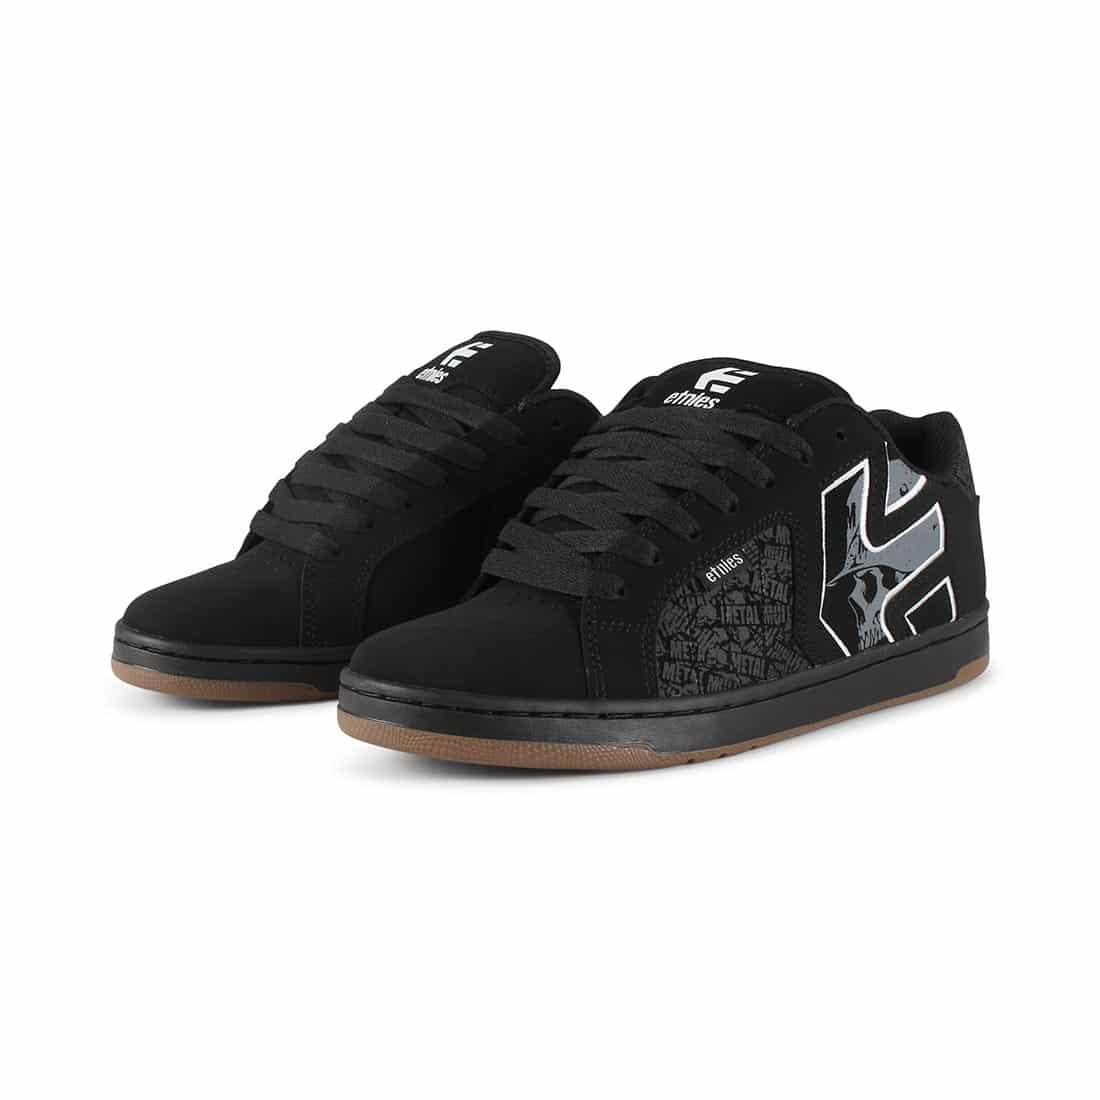 e26e998fd1b Etnies Metal Mulisha Fader 2 Shoes - Black   Grey   White